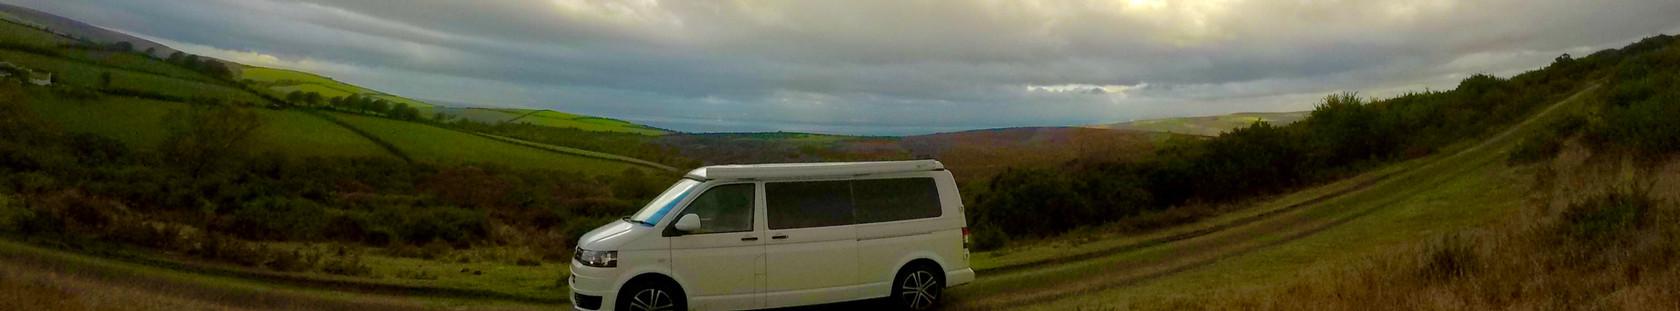 VW Campervan Hire Mountain